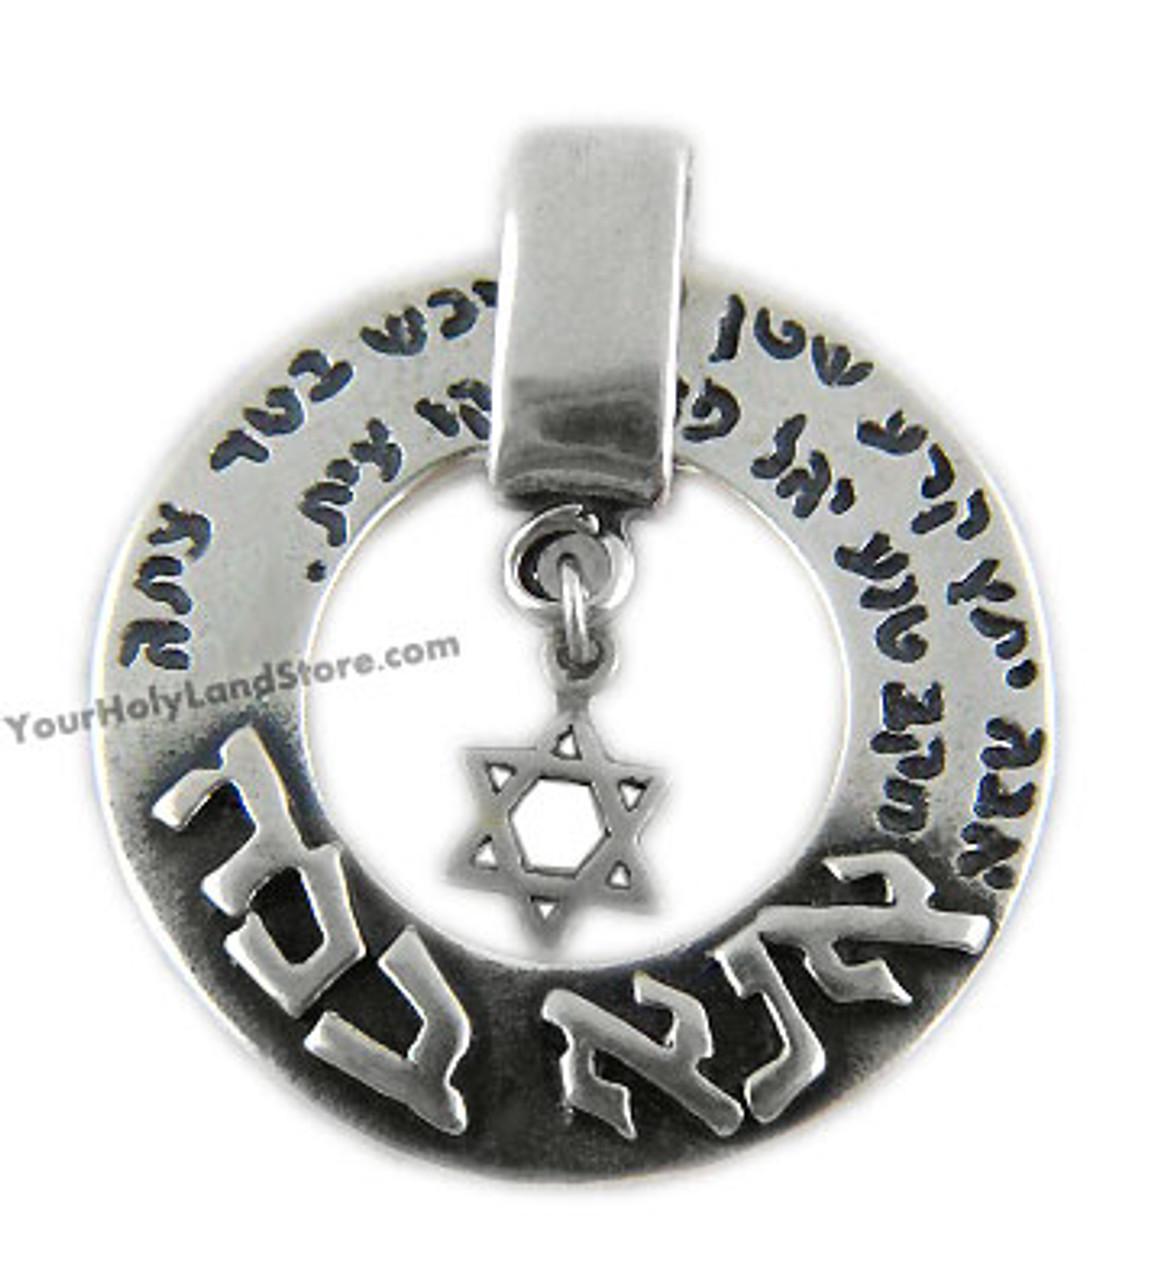 Ana Bekoach And Shema Israel Pendant With Star Of David